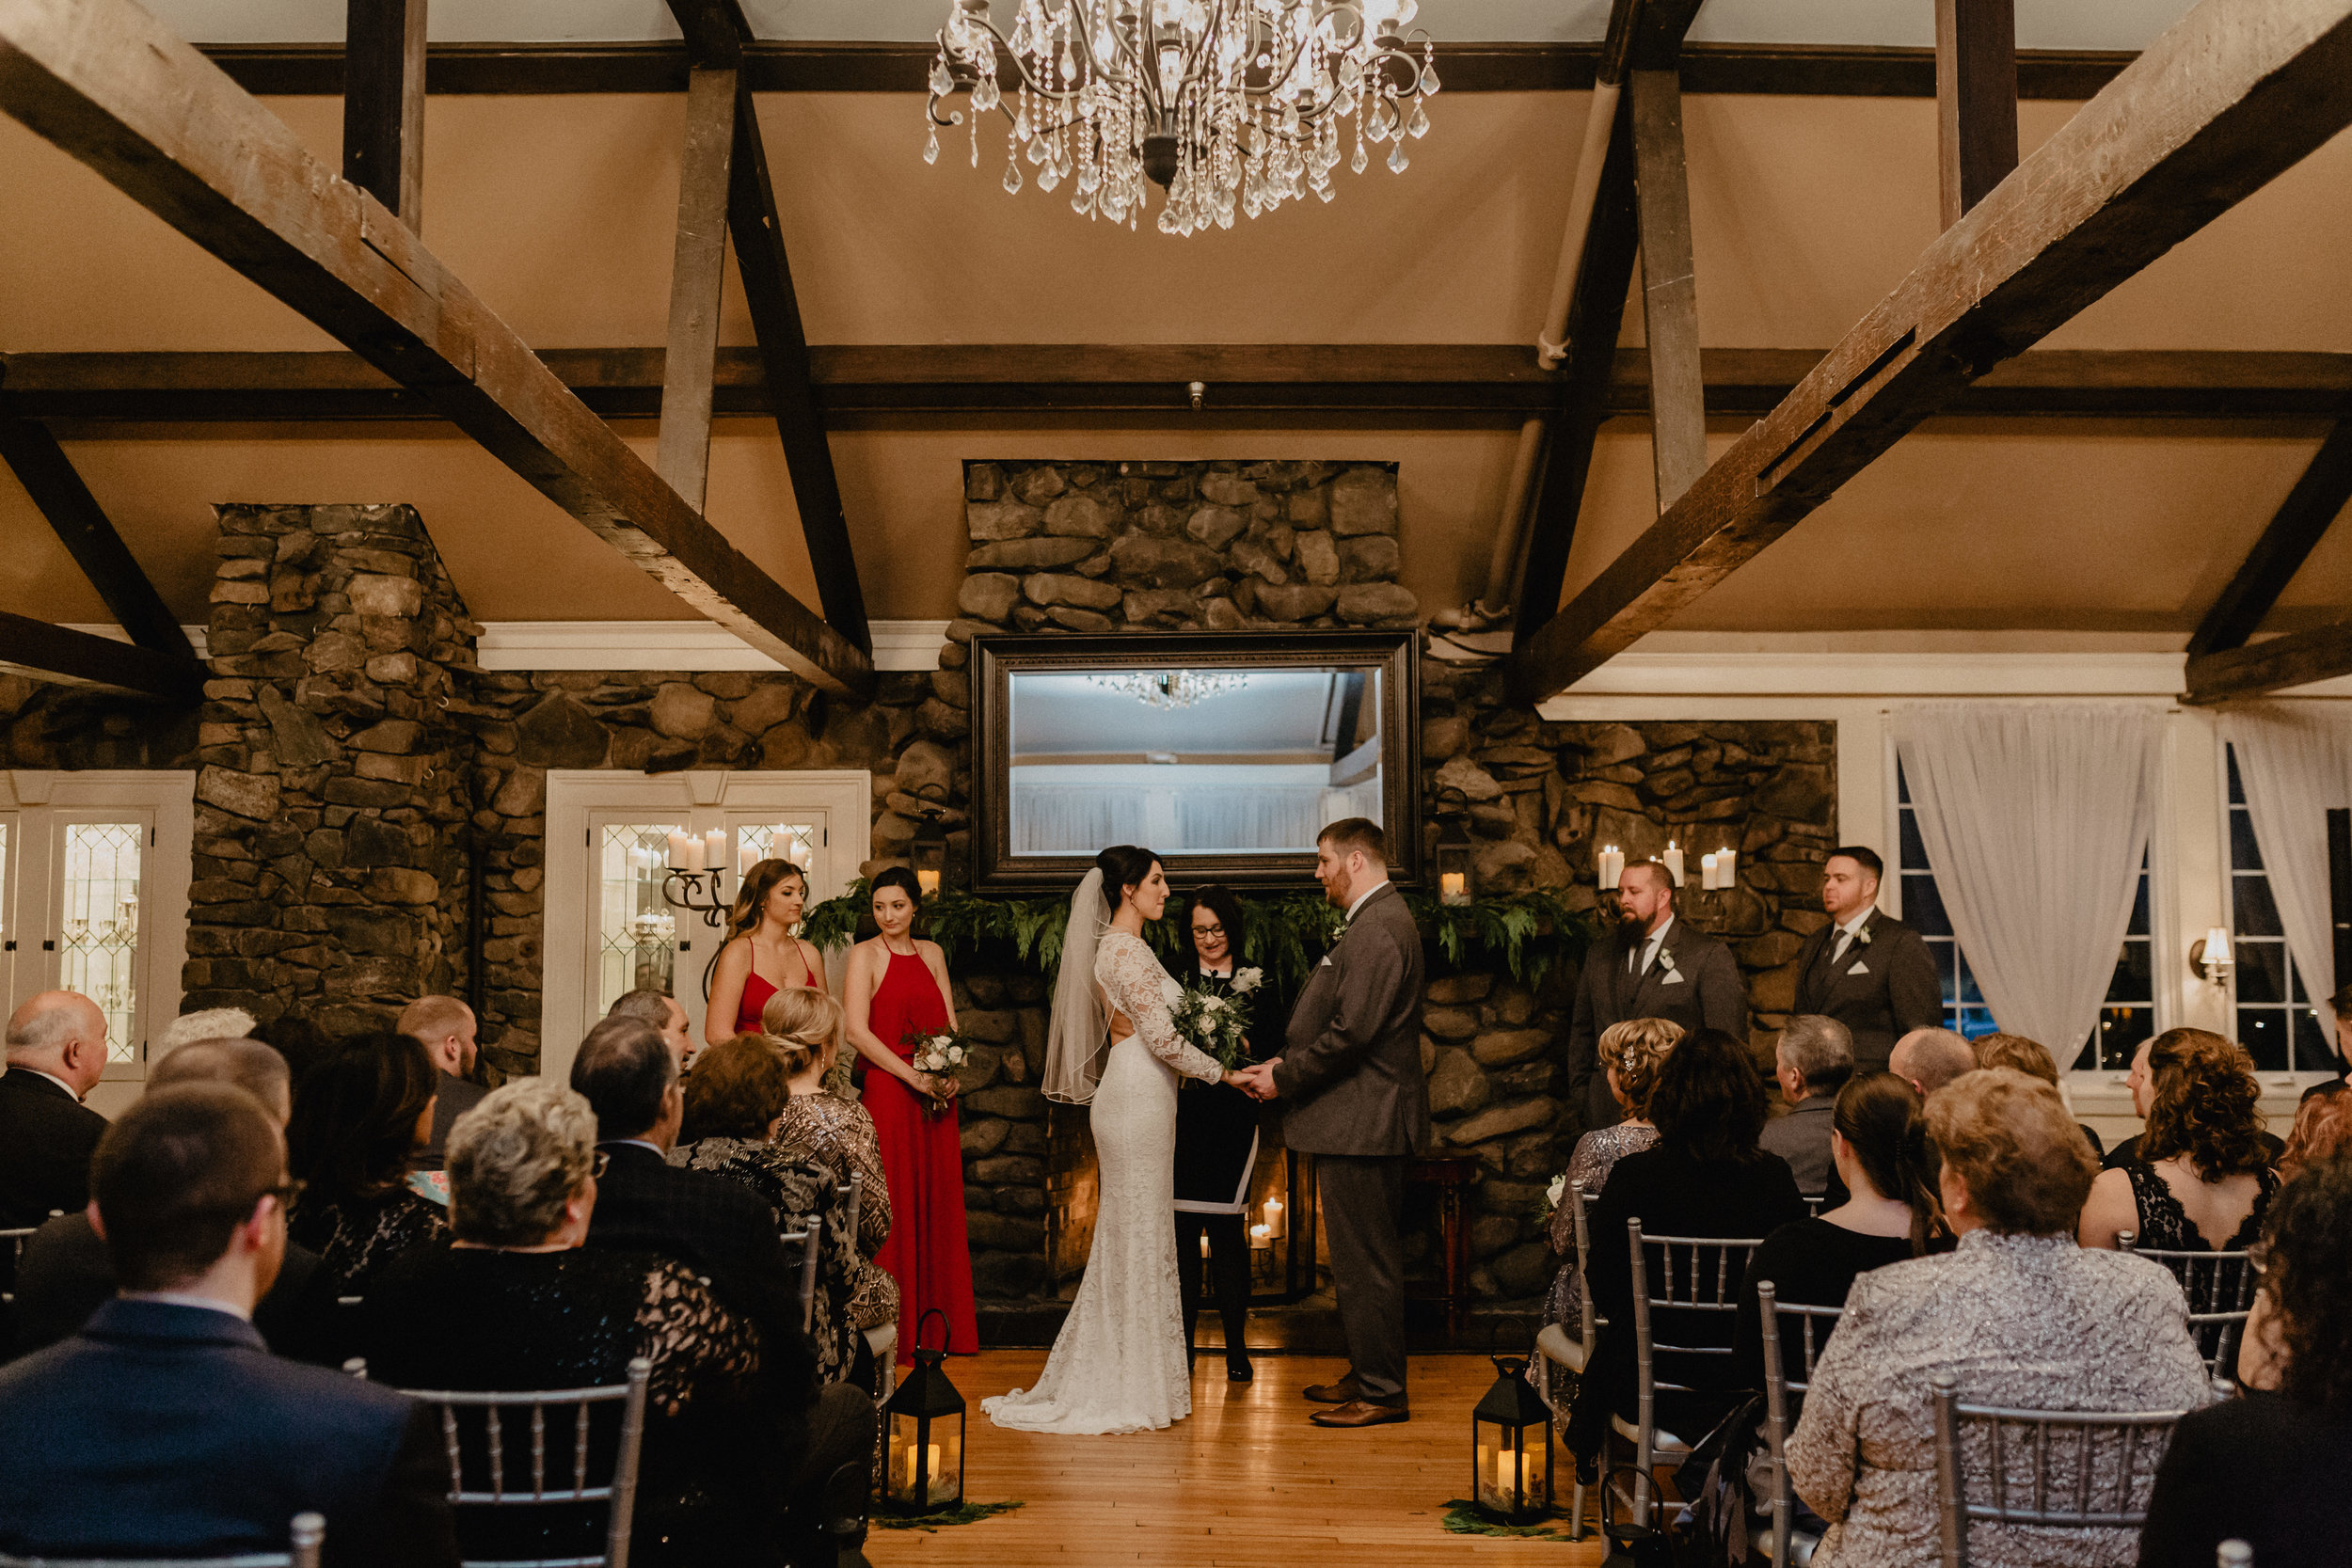 old_daley_on_crooked_lake_wedding_049.jpg